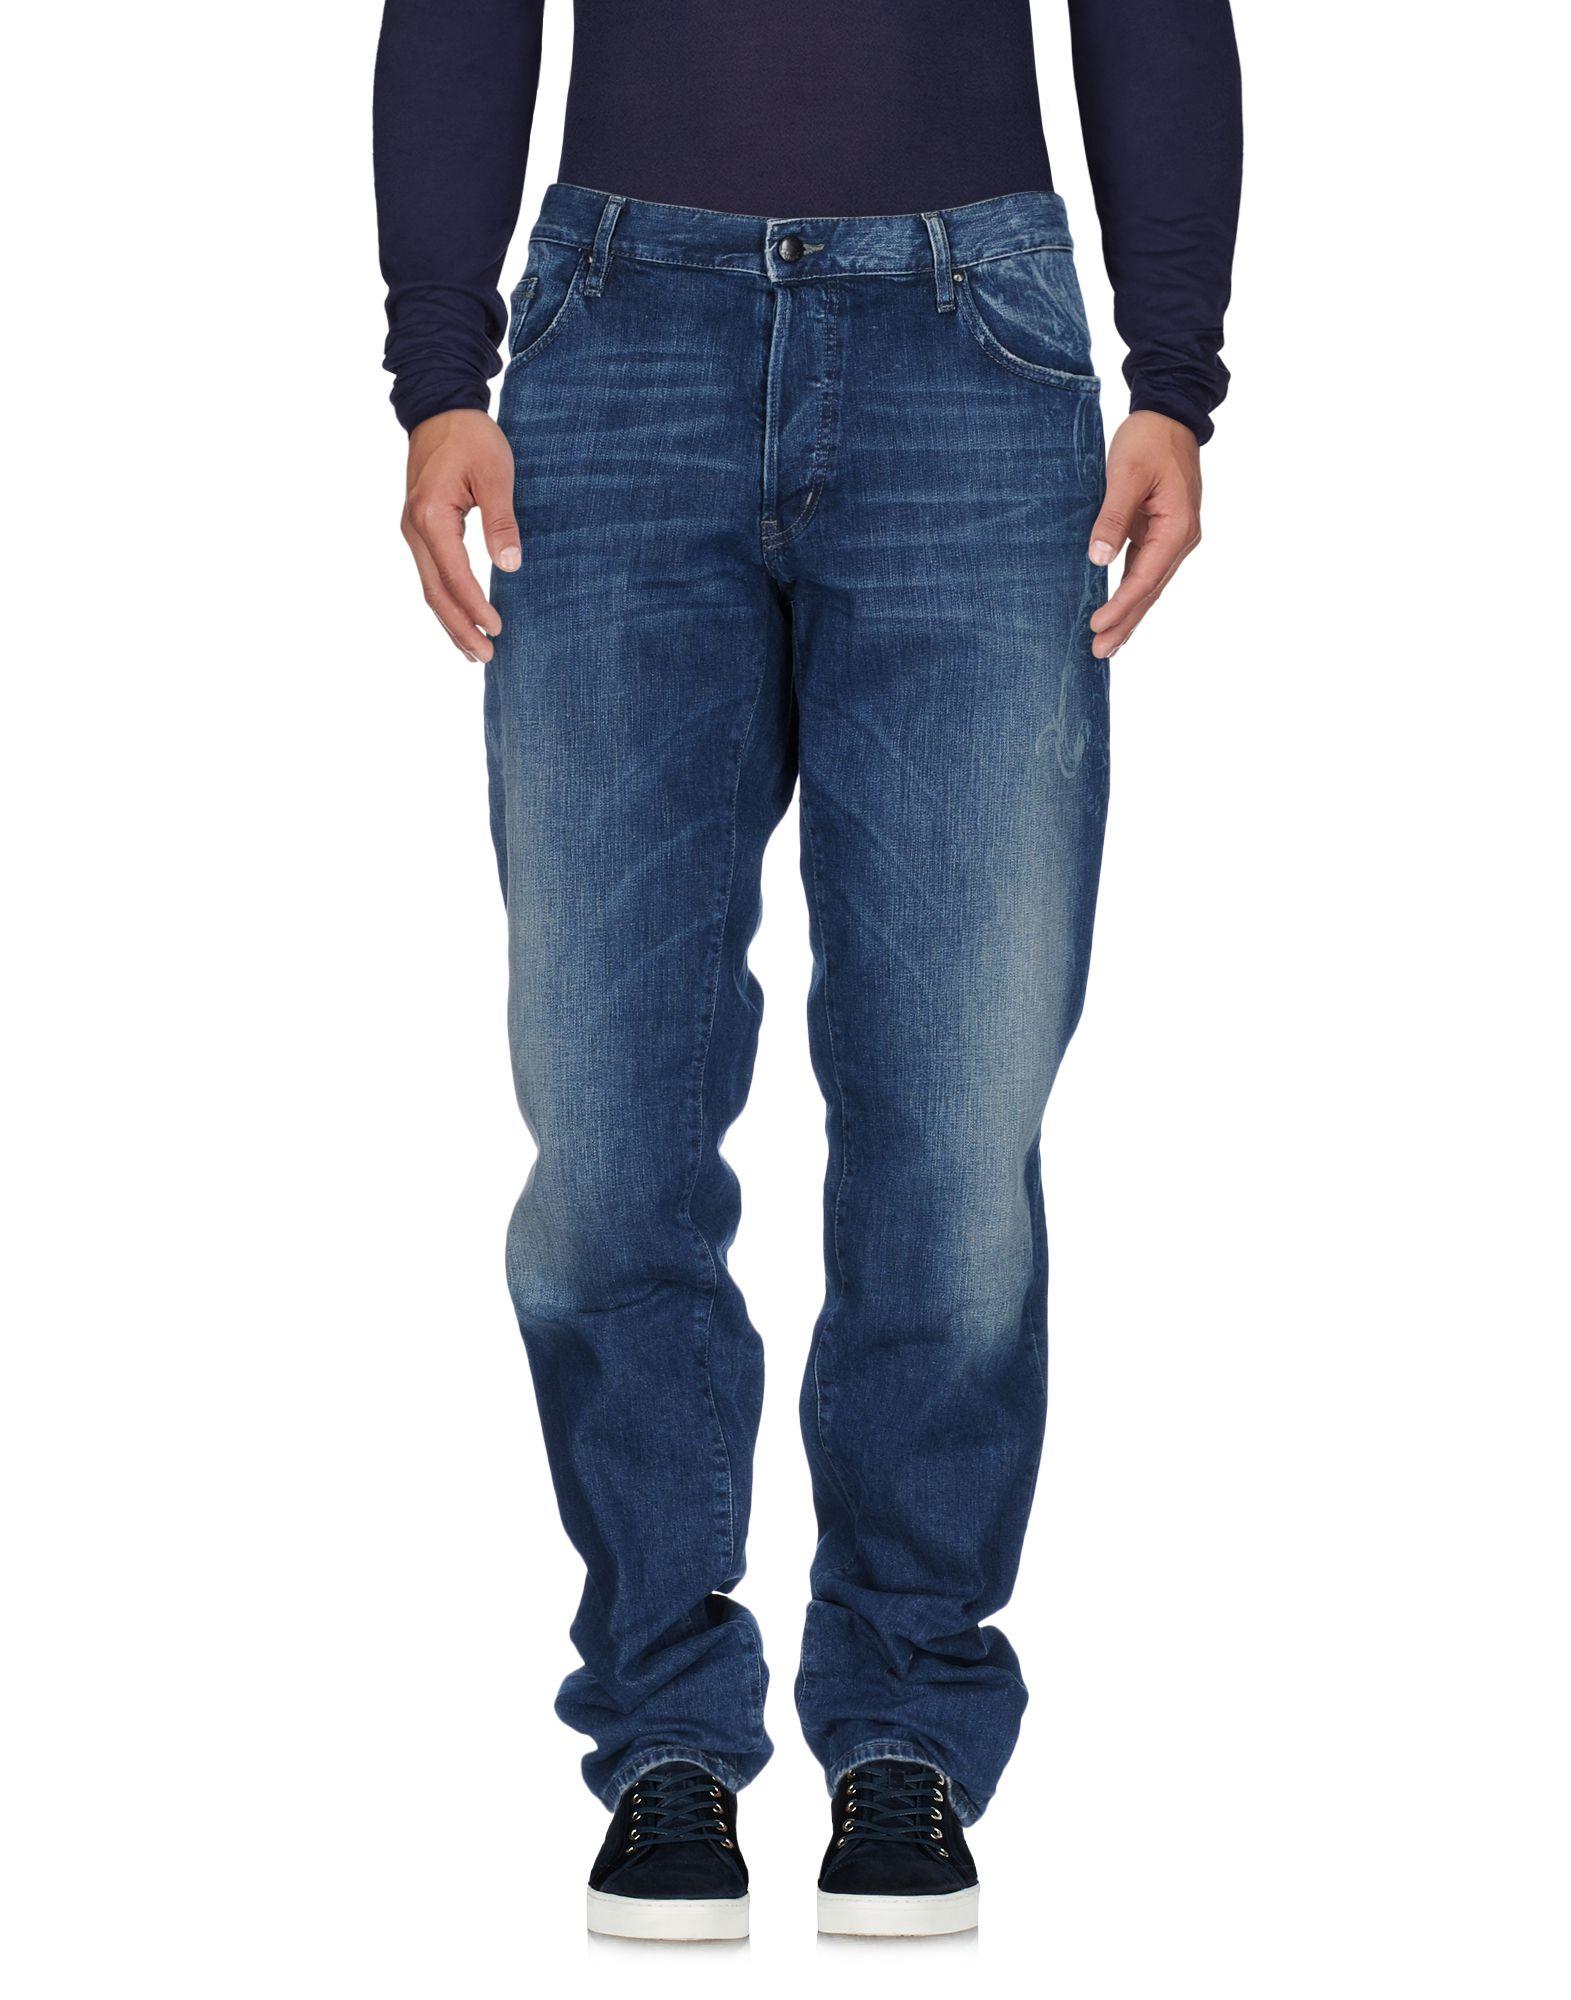 Pantaloni Jeans Just Cavalli Donna - Acquista online su